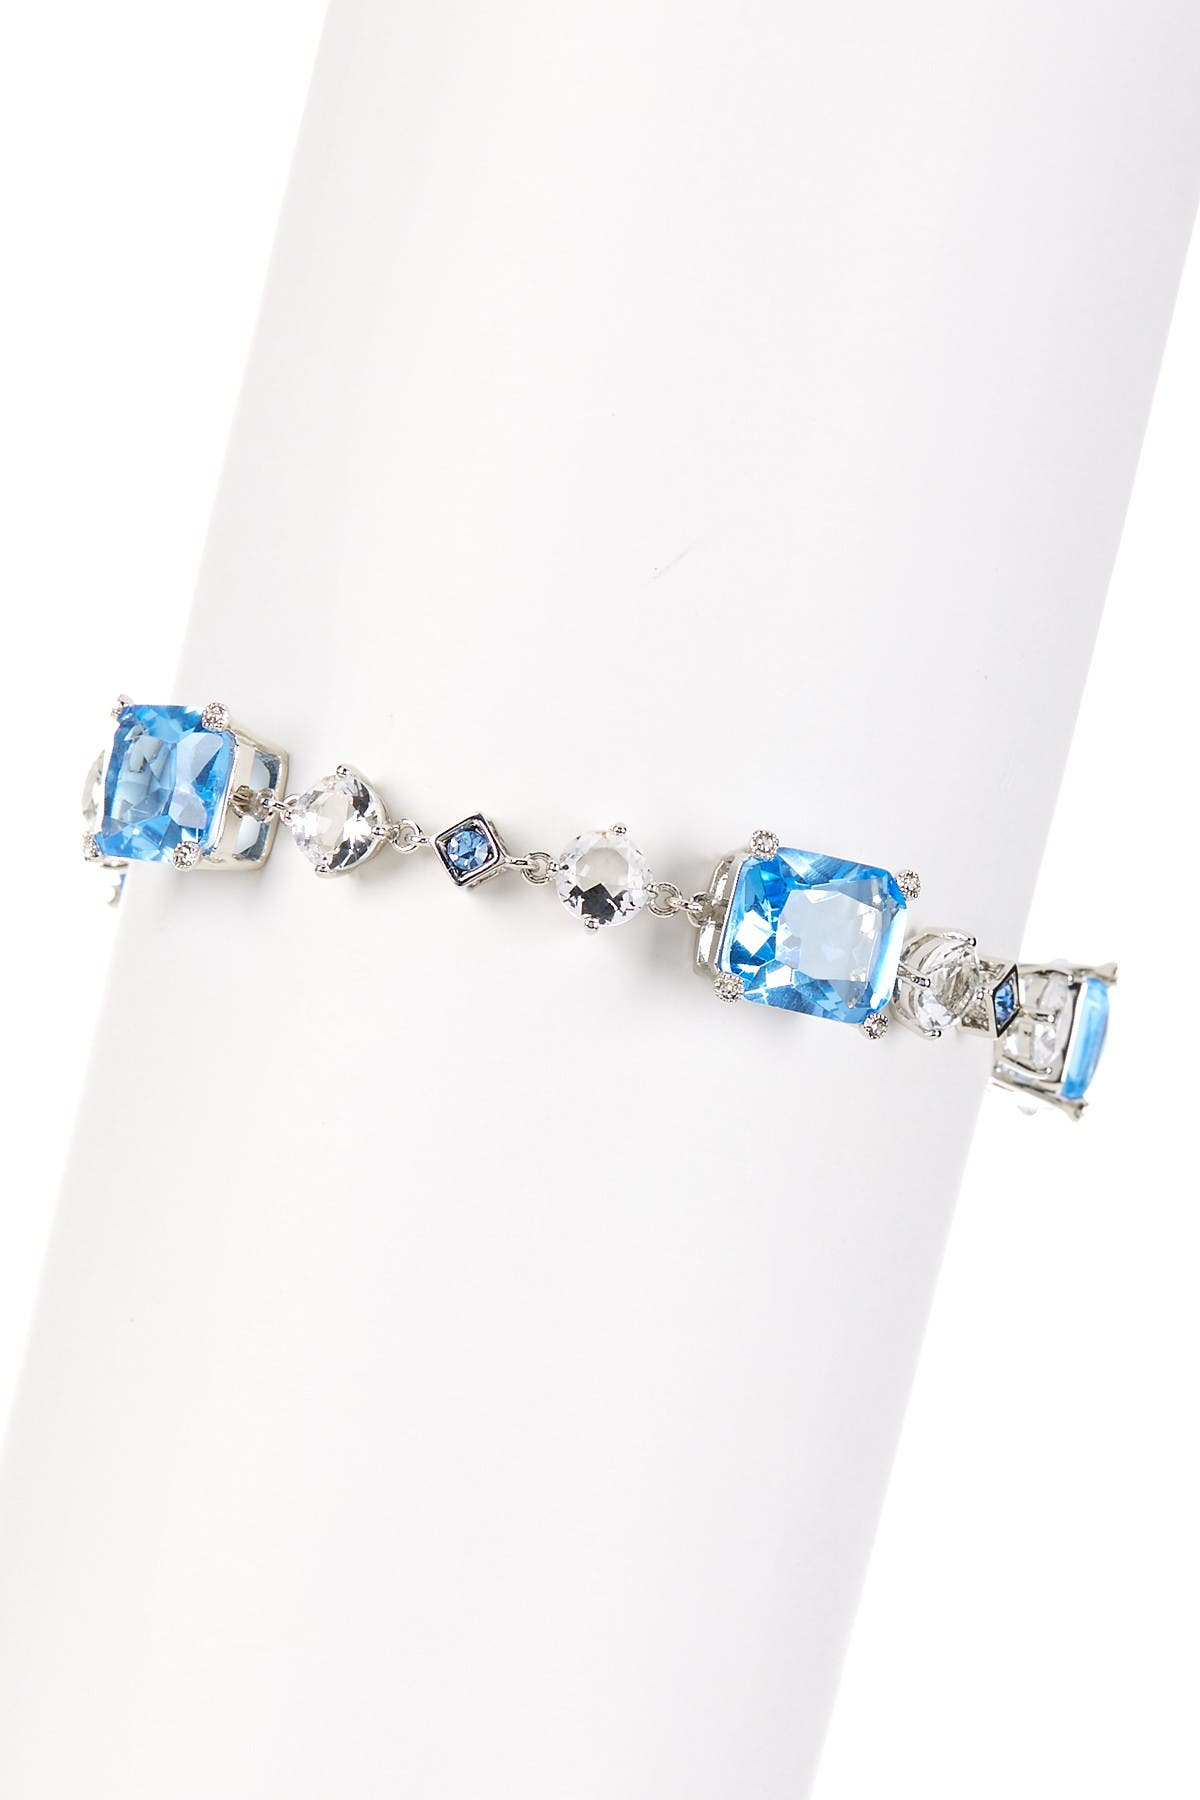 Image of Carolee Newport Nouveau Blue & White Station Bracelet